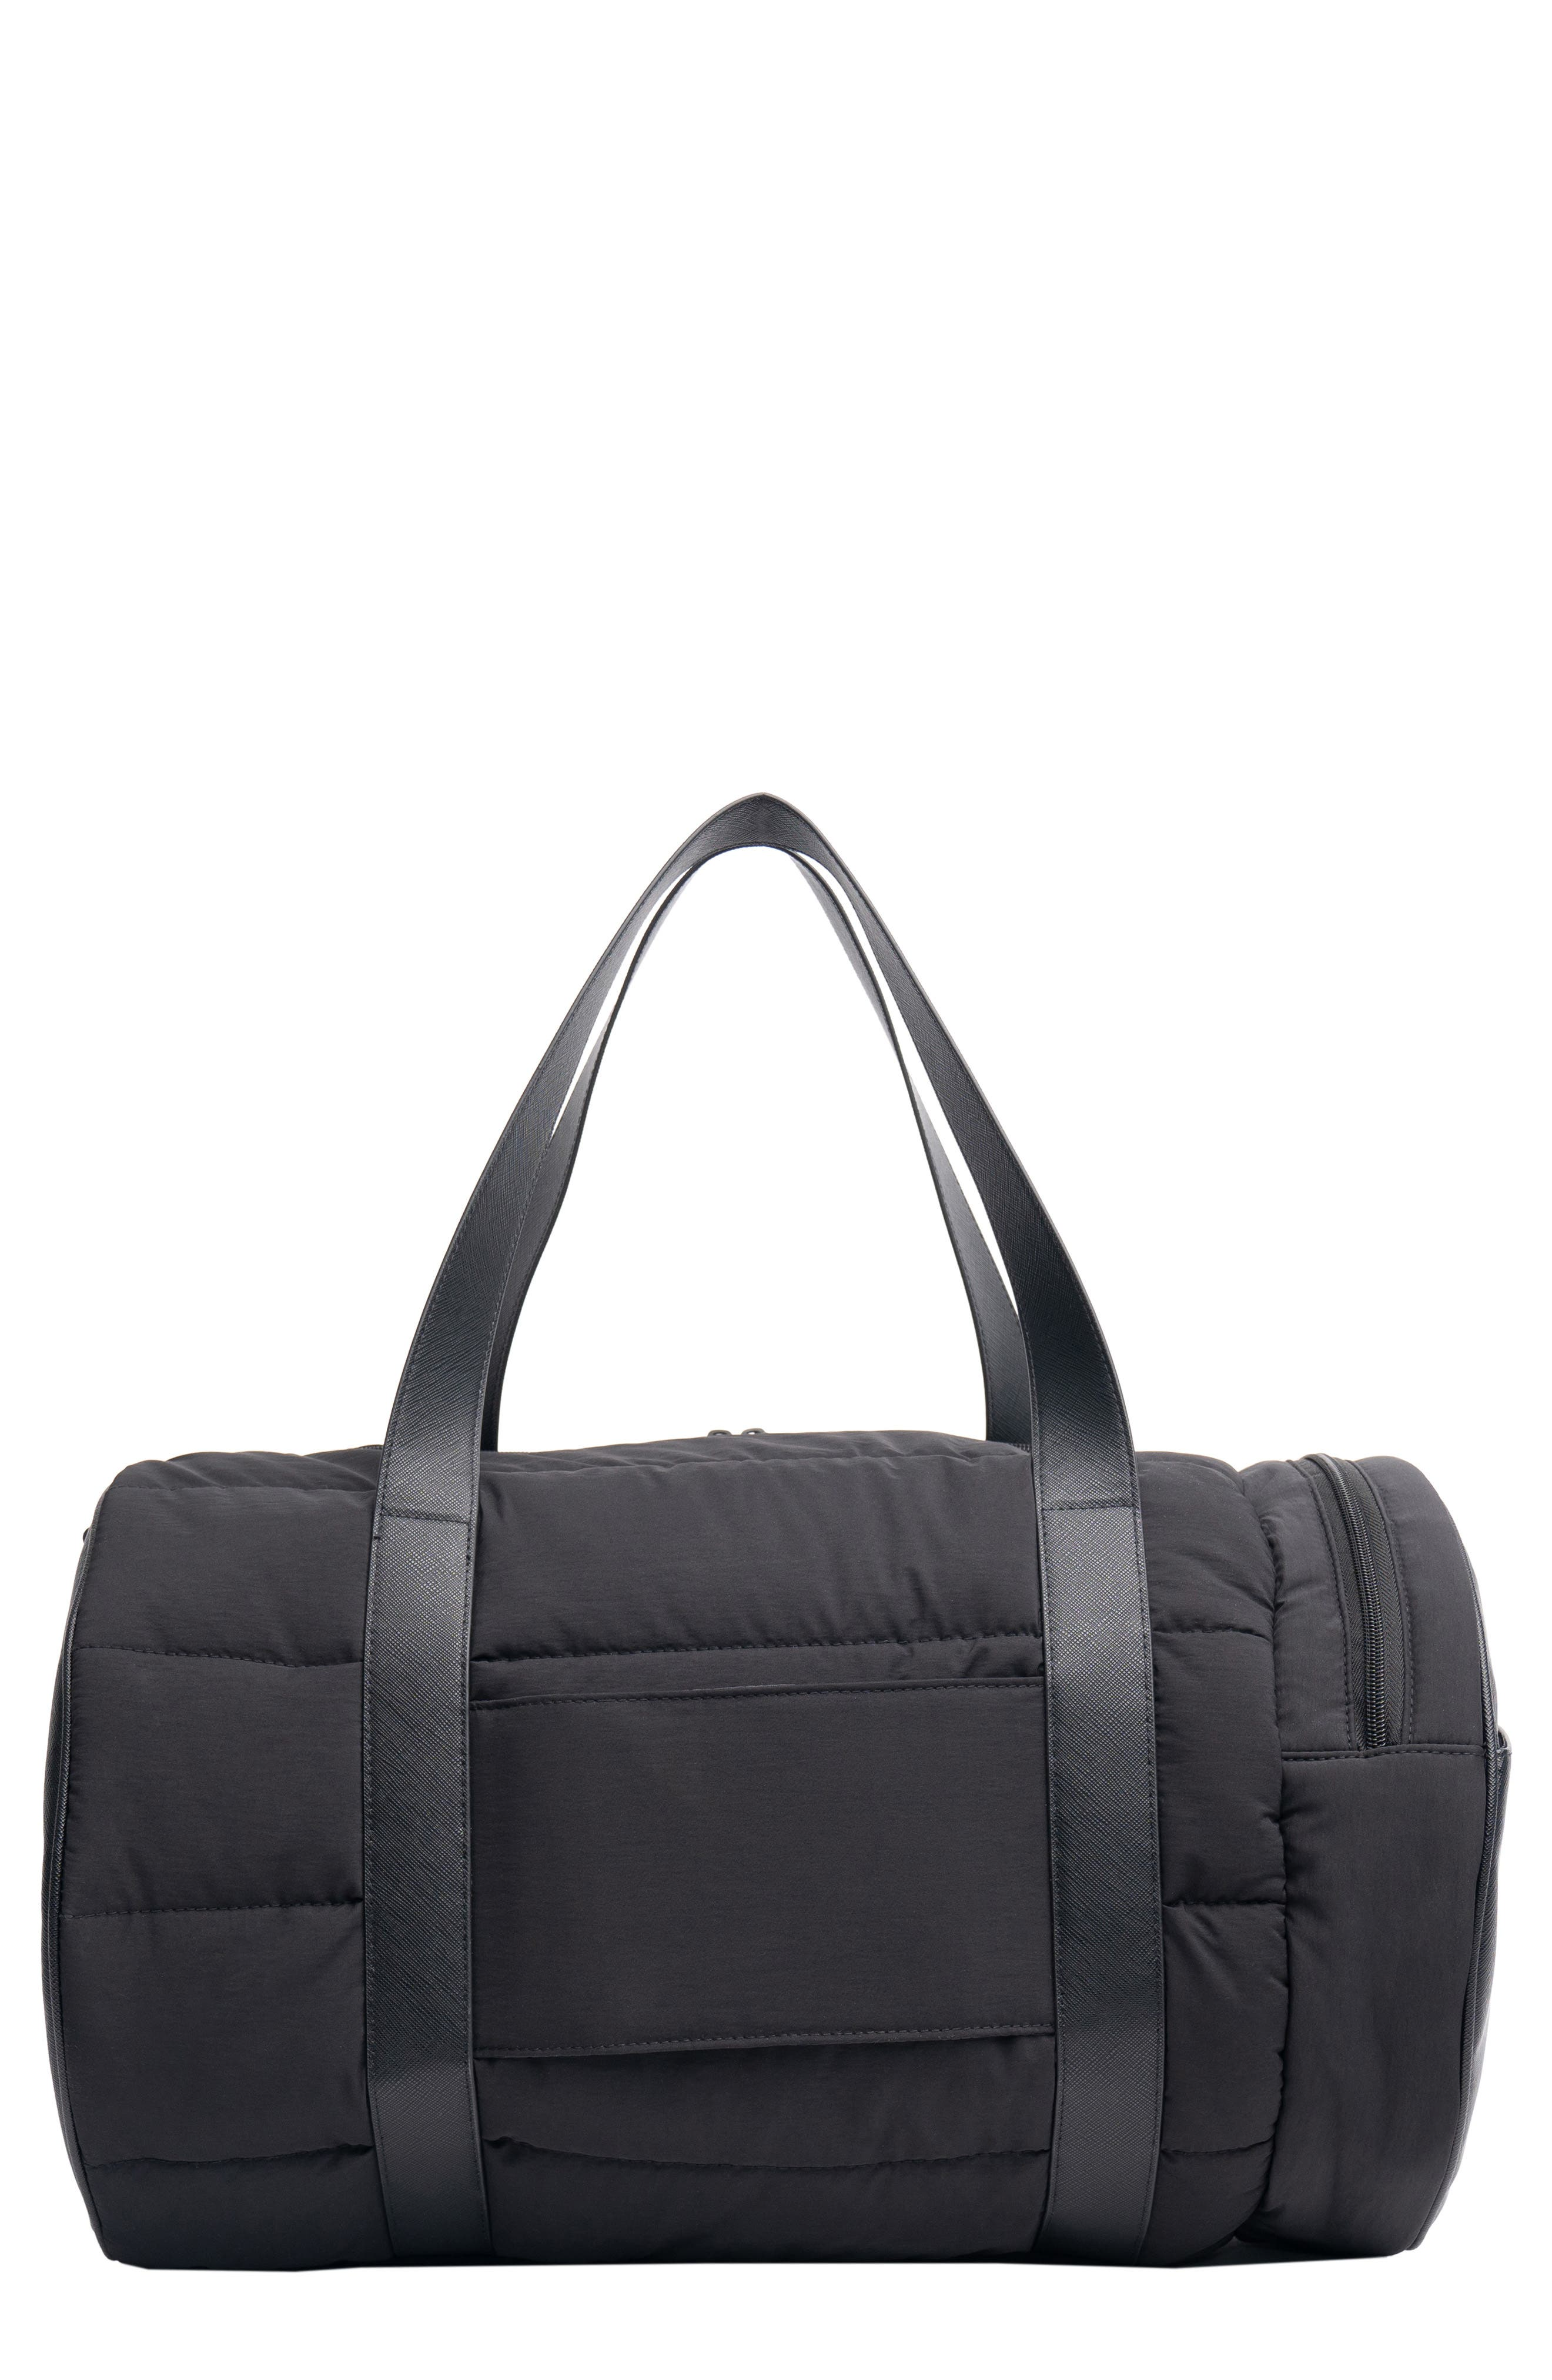 The Mini Duffle Bag